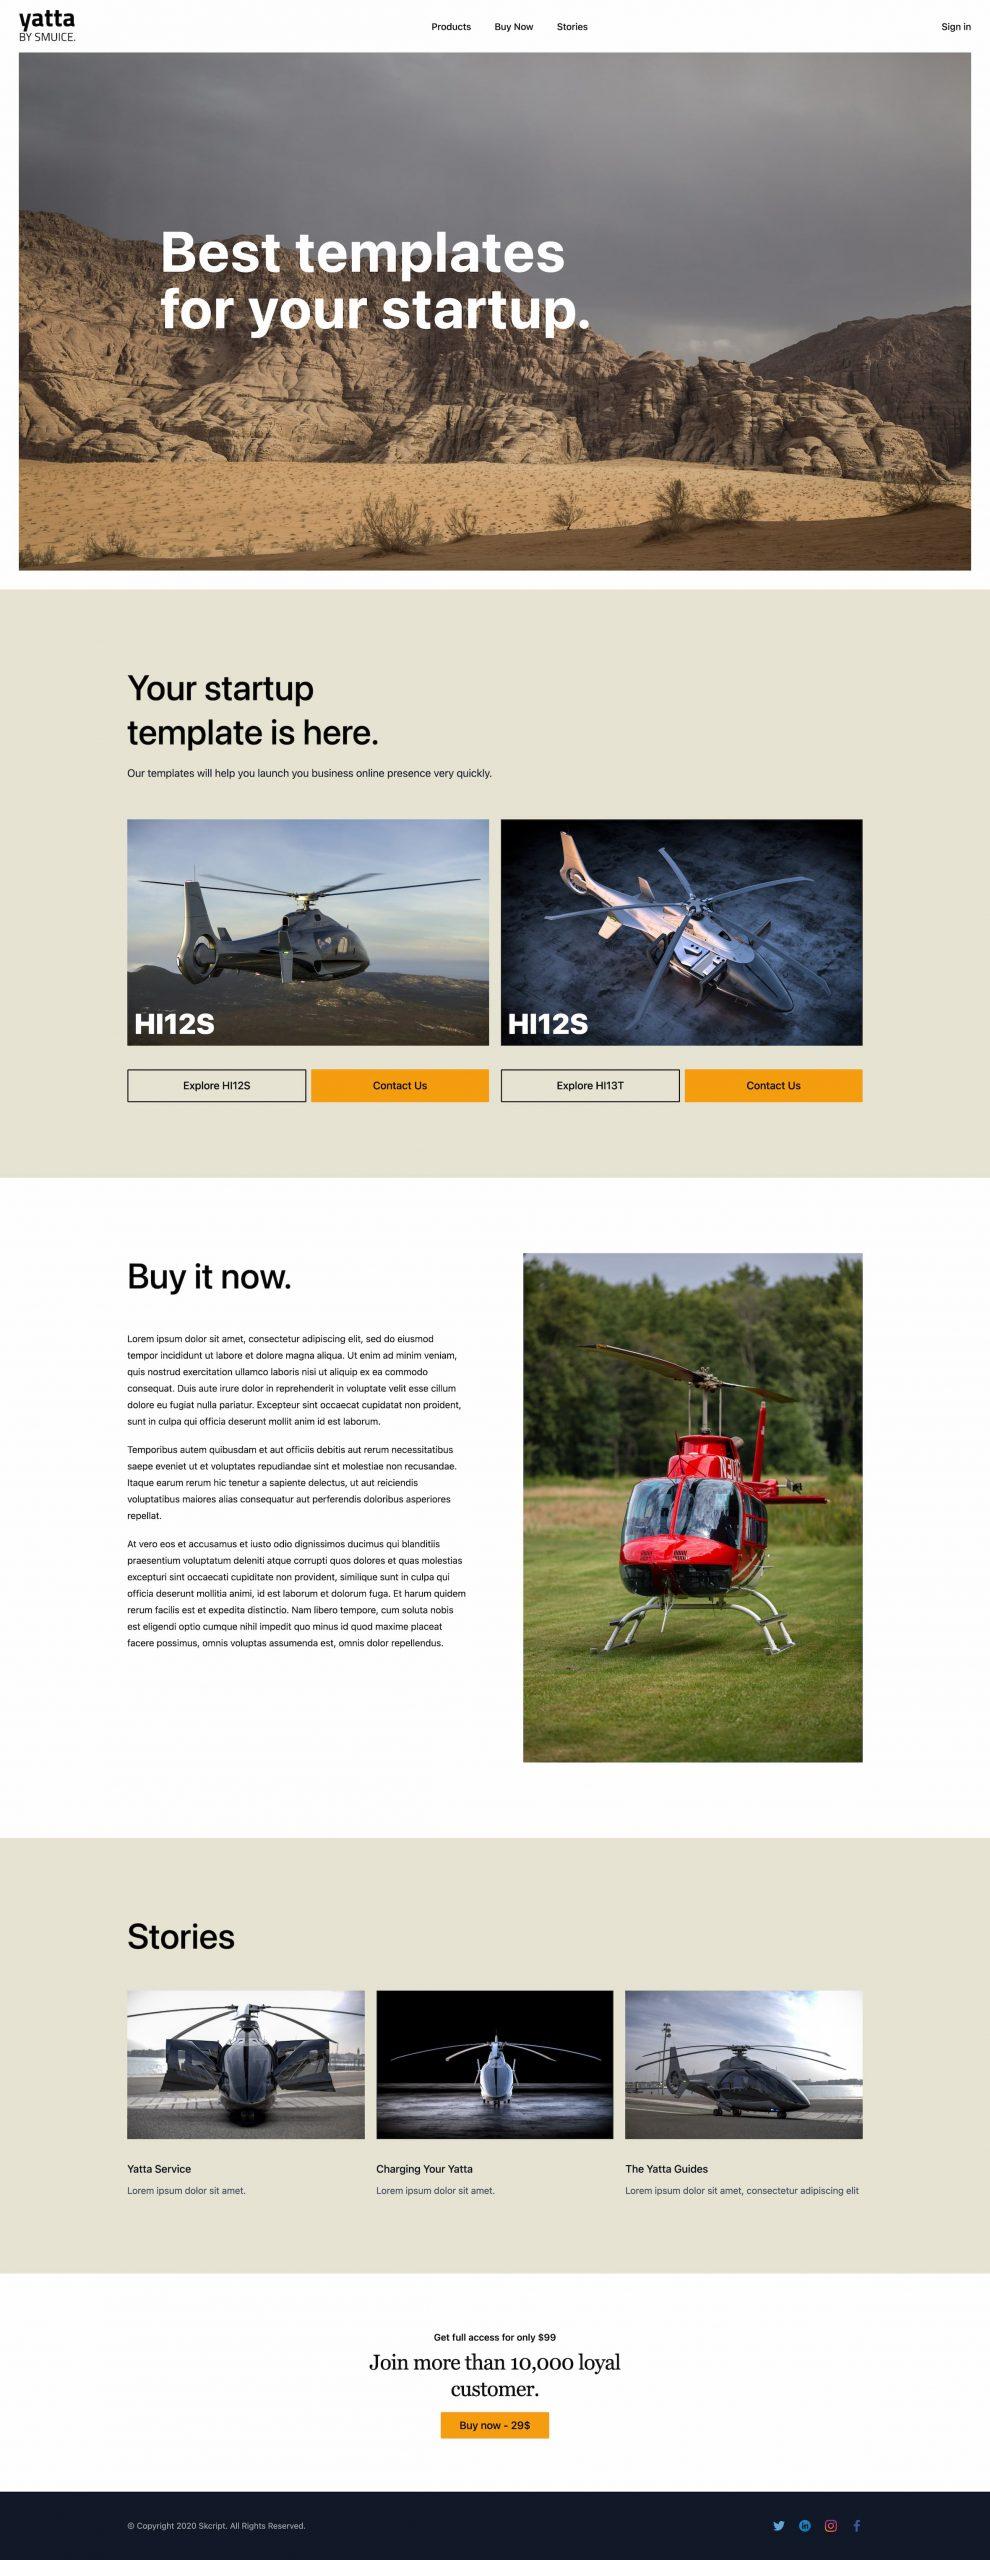 yatta-smuice-template-landing-page